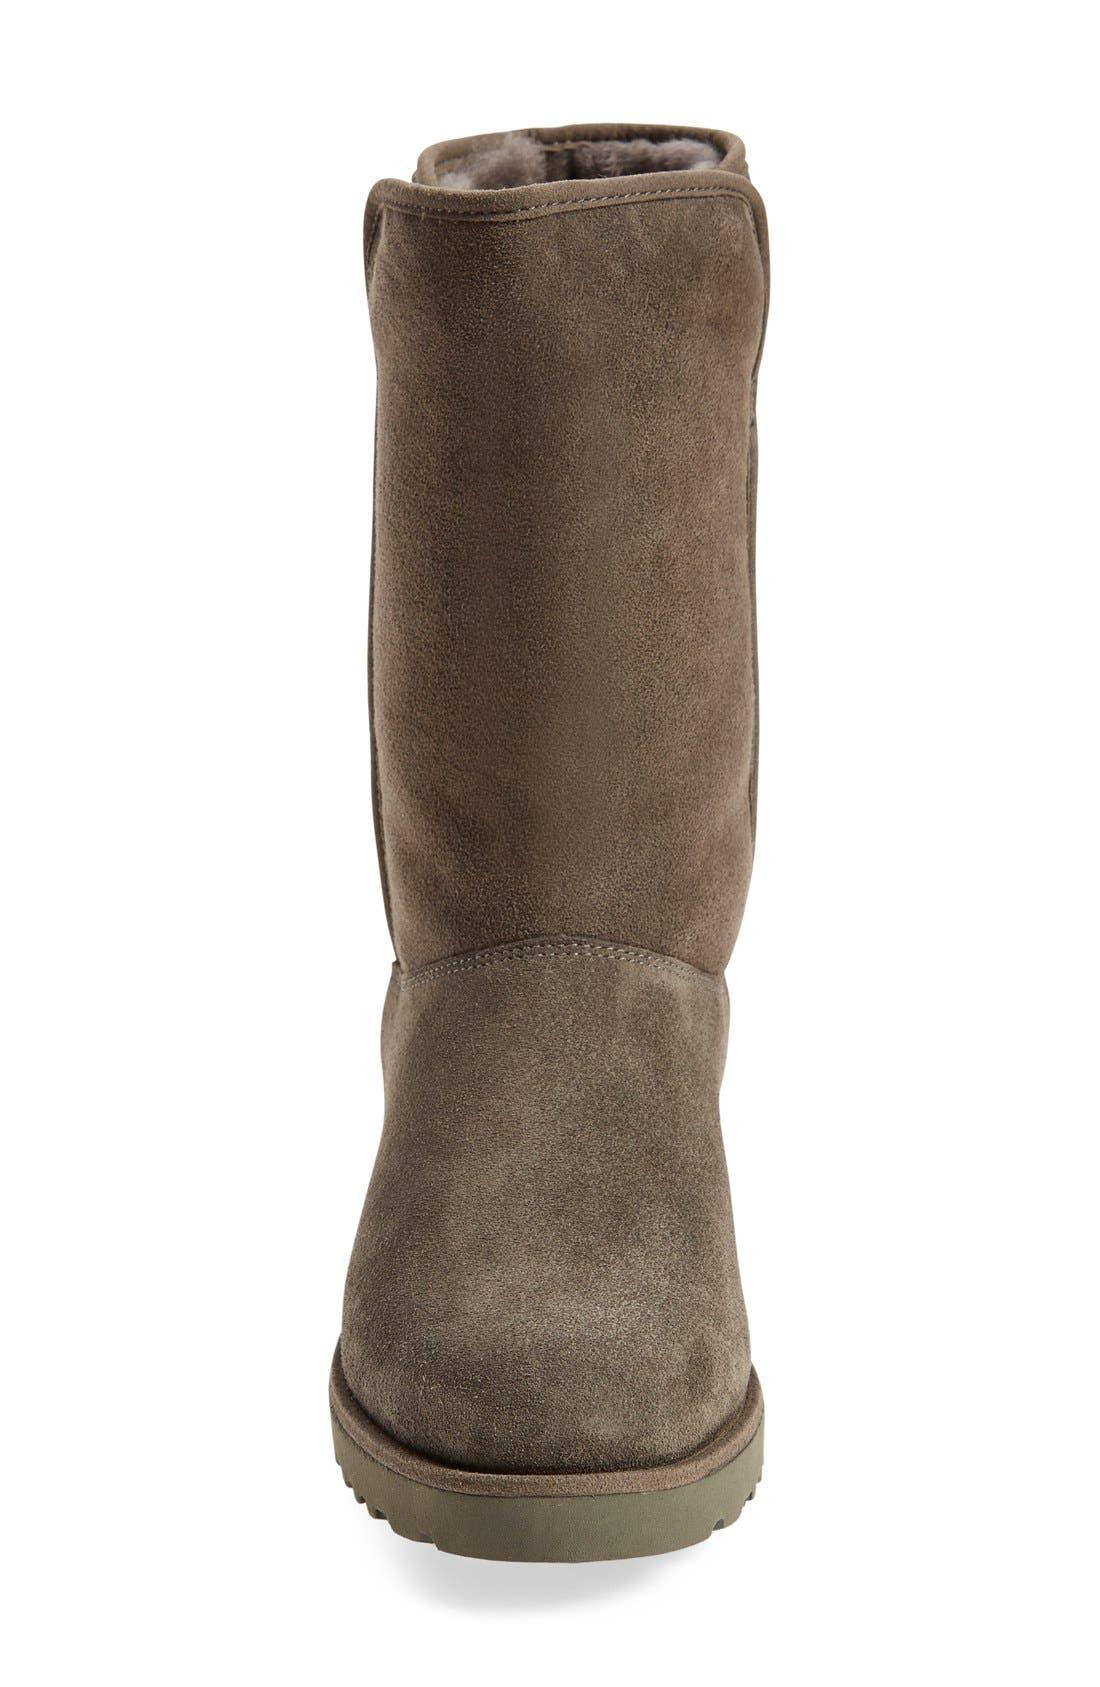 Alternate Image 3  - UGG® Amie - Classic Slim™ Water Resistant Short Boot (Women)